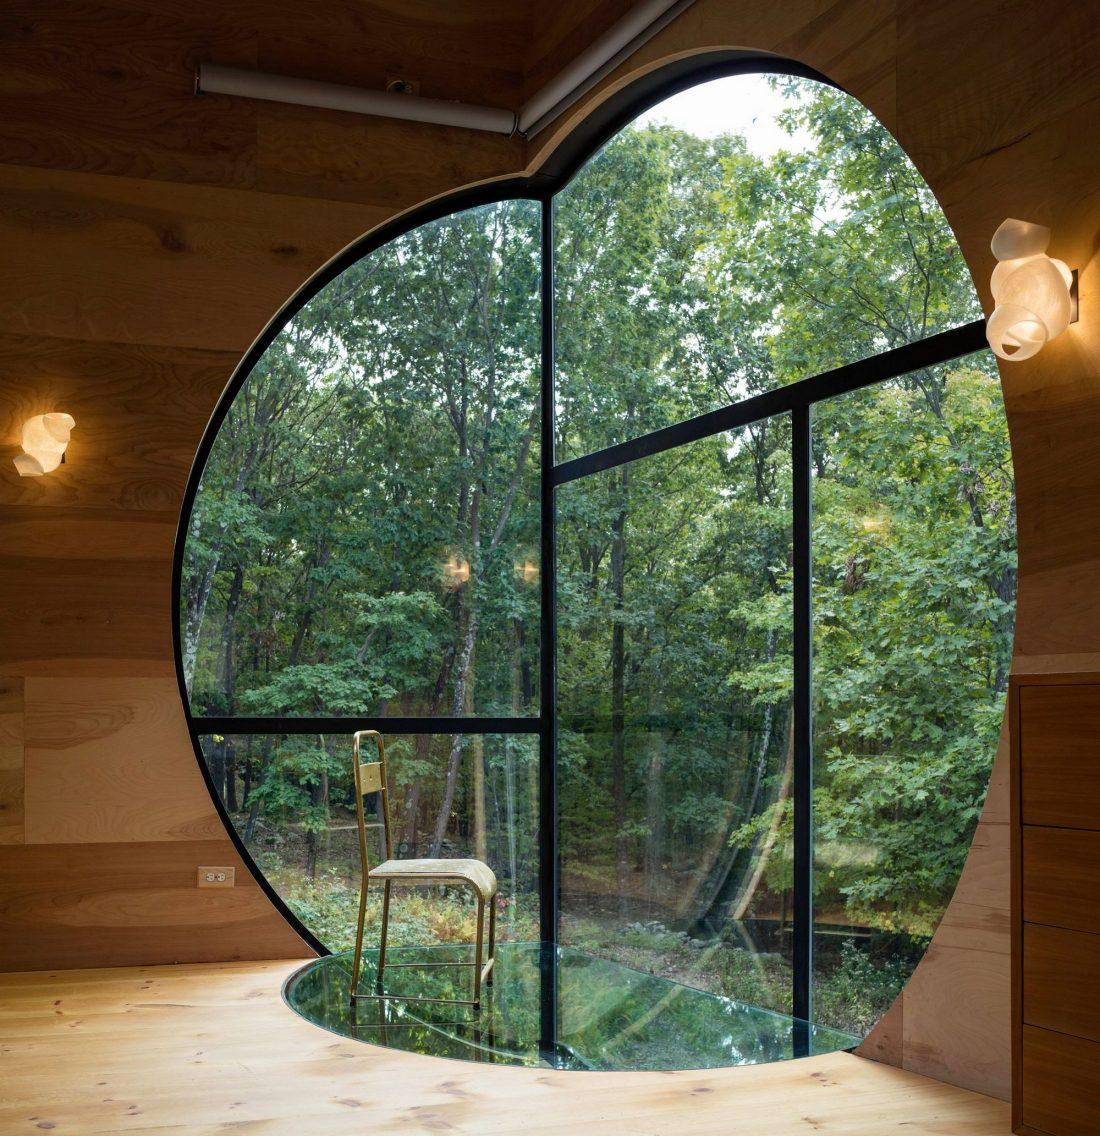 4d-gostevoj-dom-v-lesu-po-proektu-steven-holl-architects-21